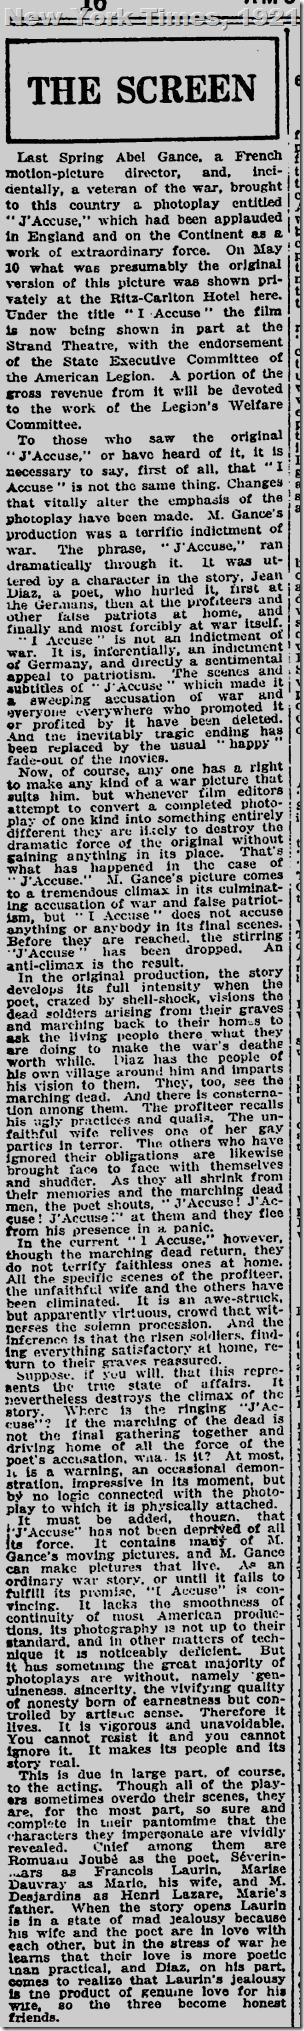 New York Times, Oct. 10, 1921